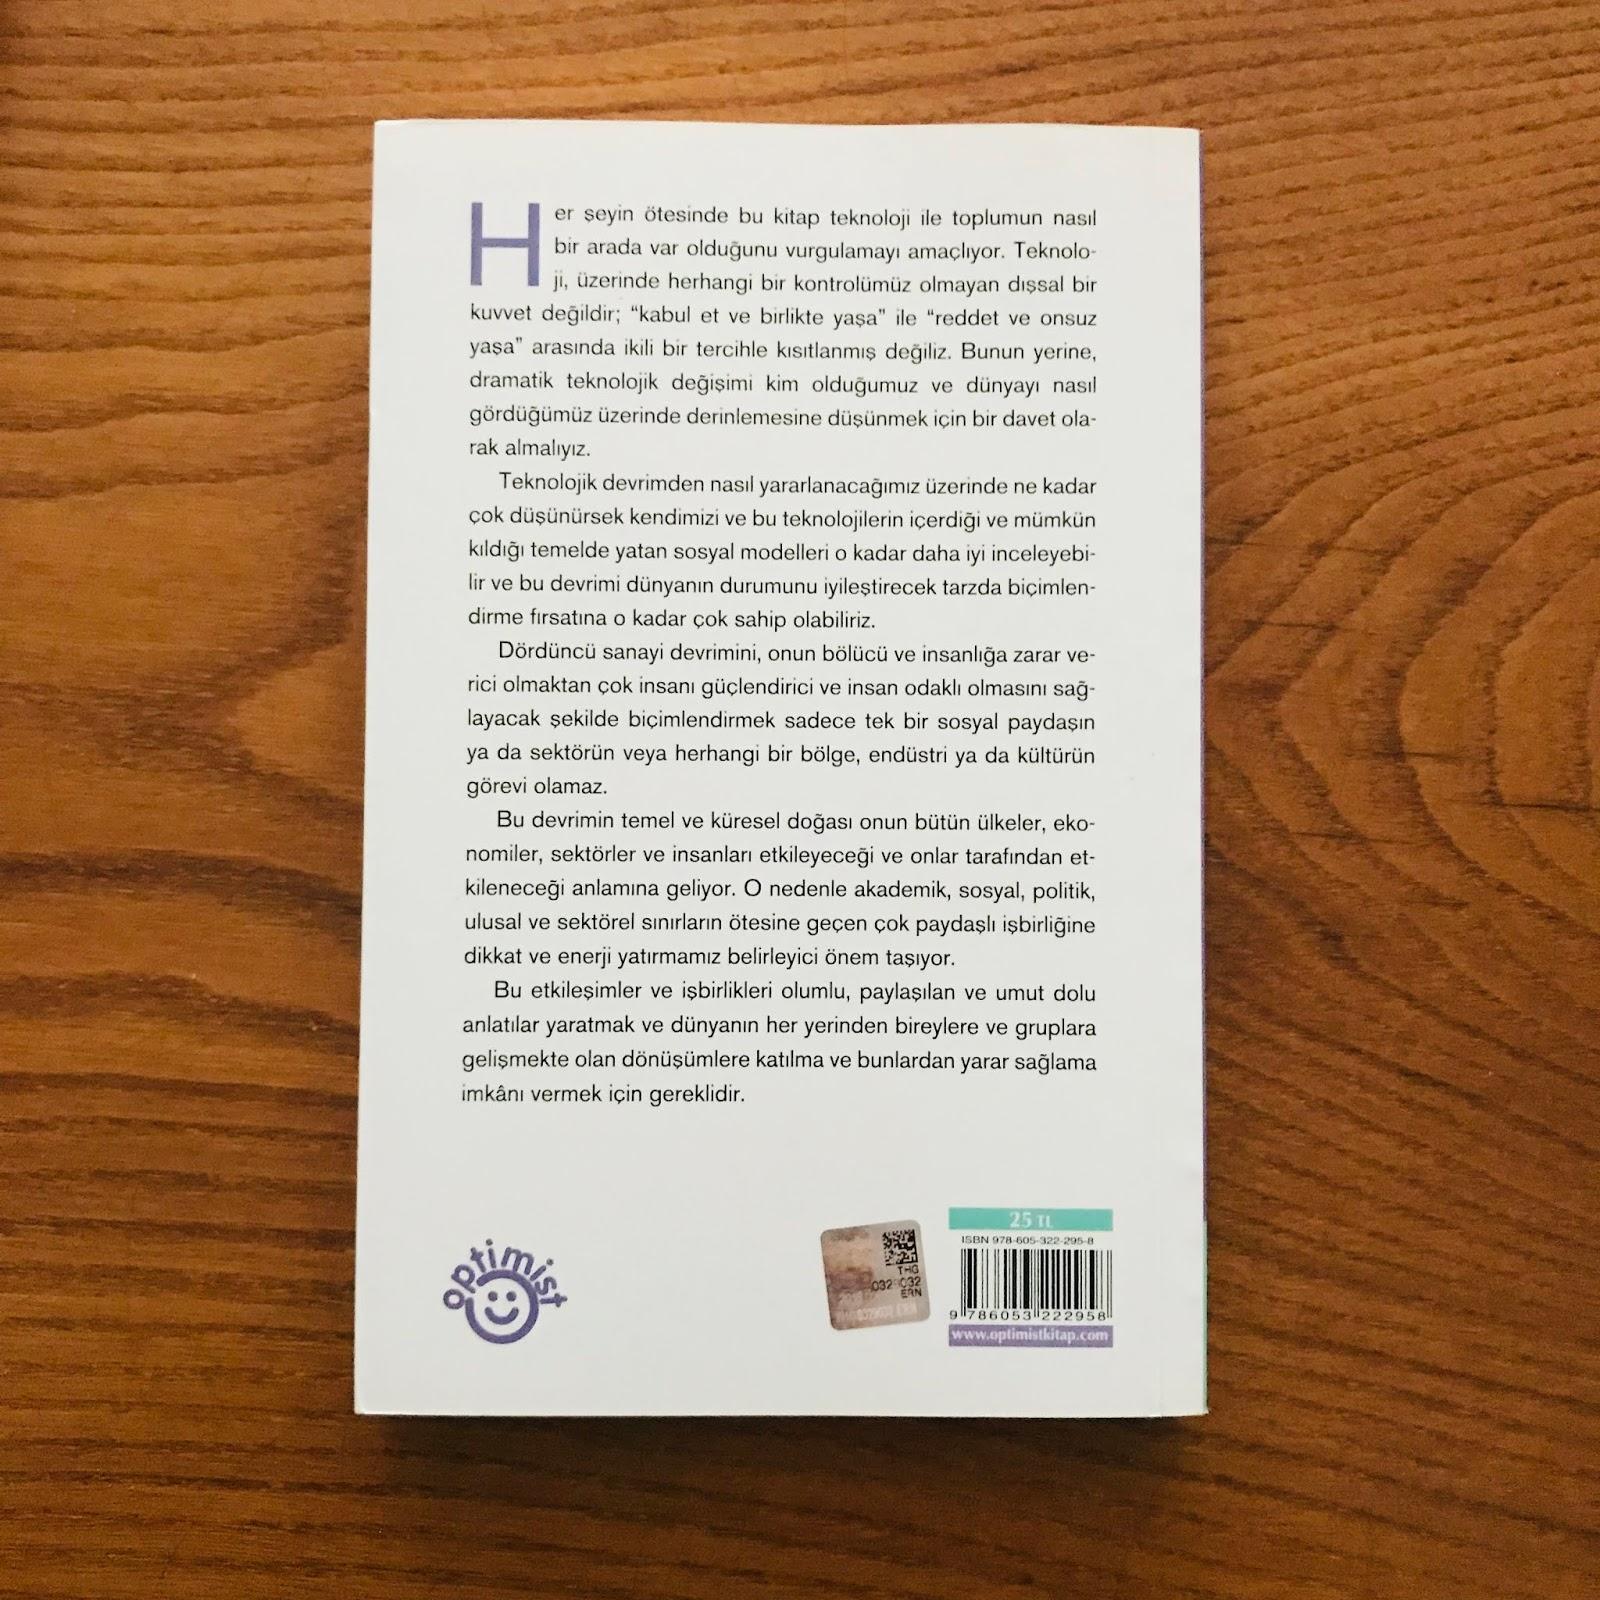 Dorduncu Sanayi Devrimi (Kitap)